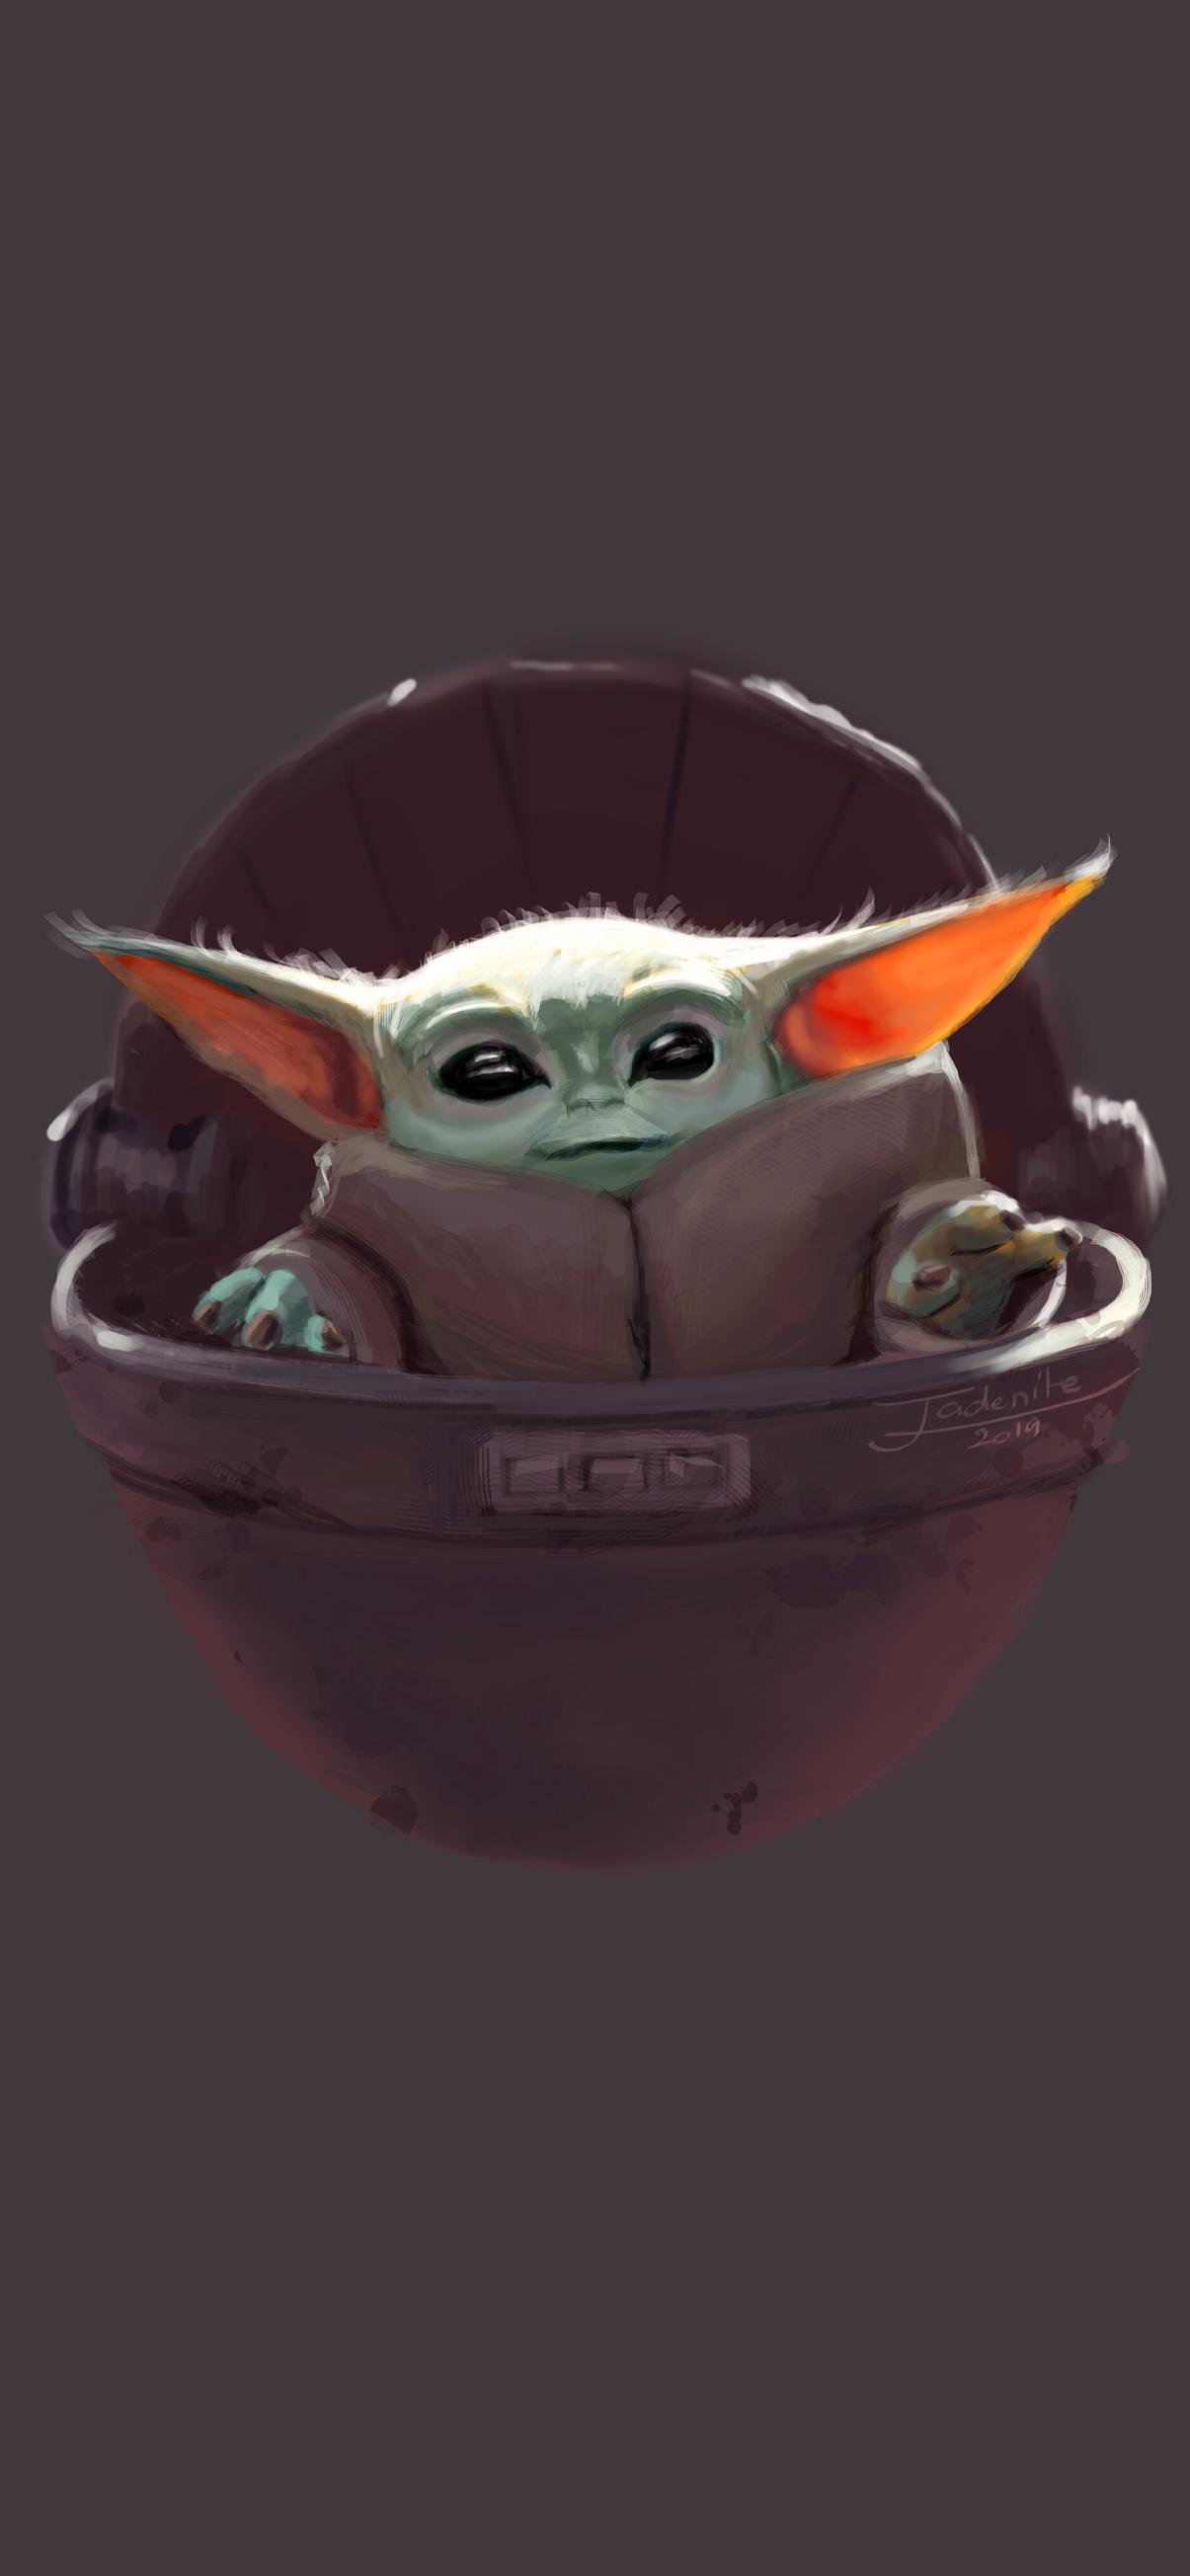 Baby Yoda Iphone Wallpaper Xr